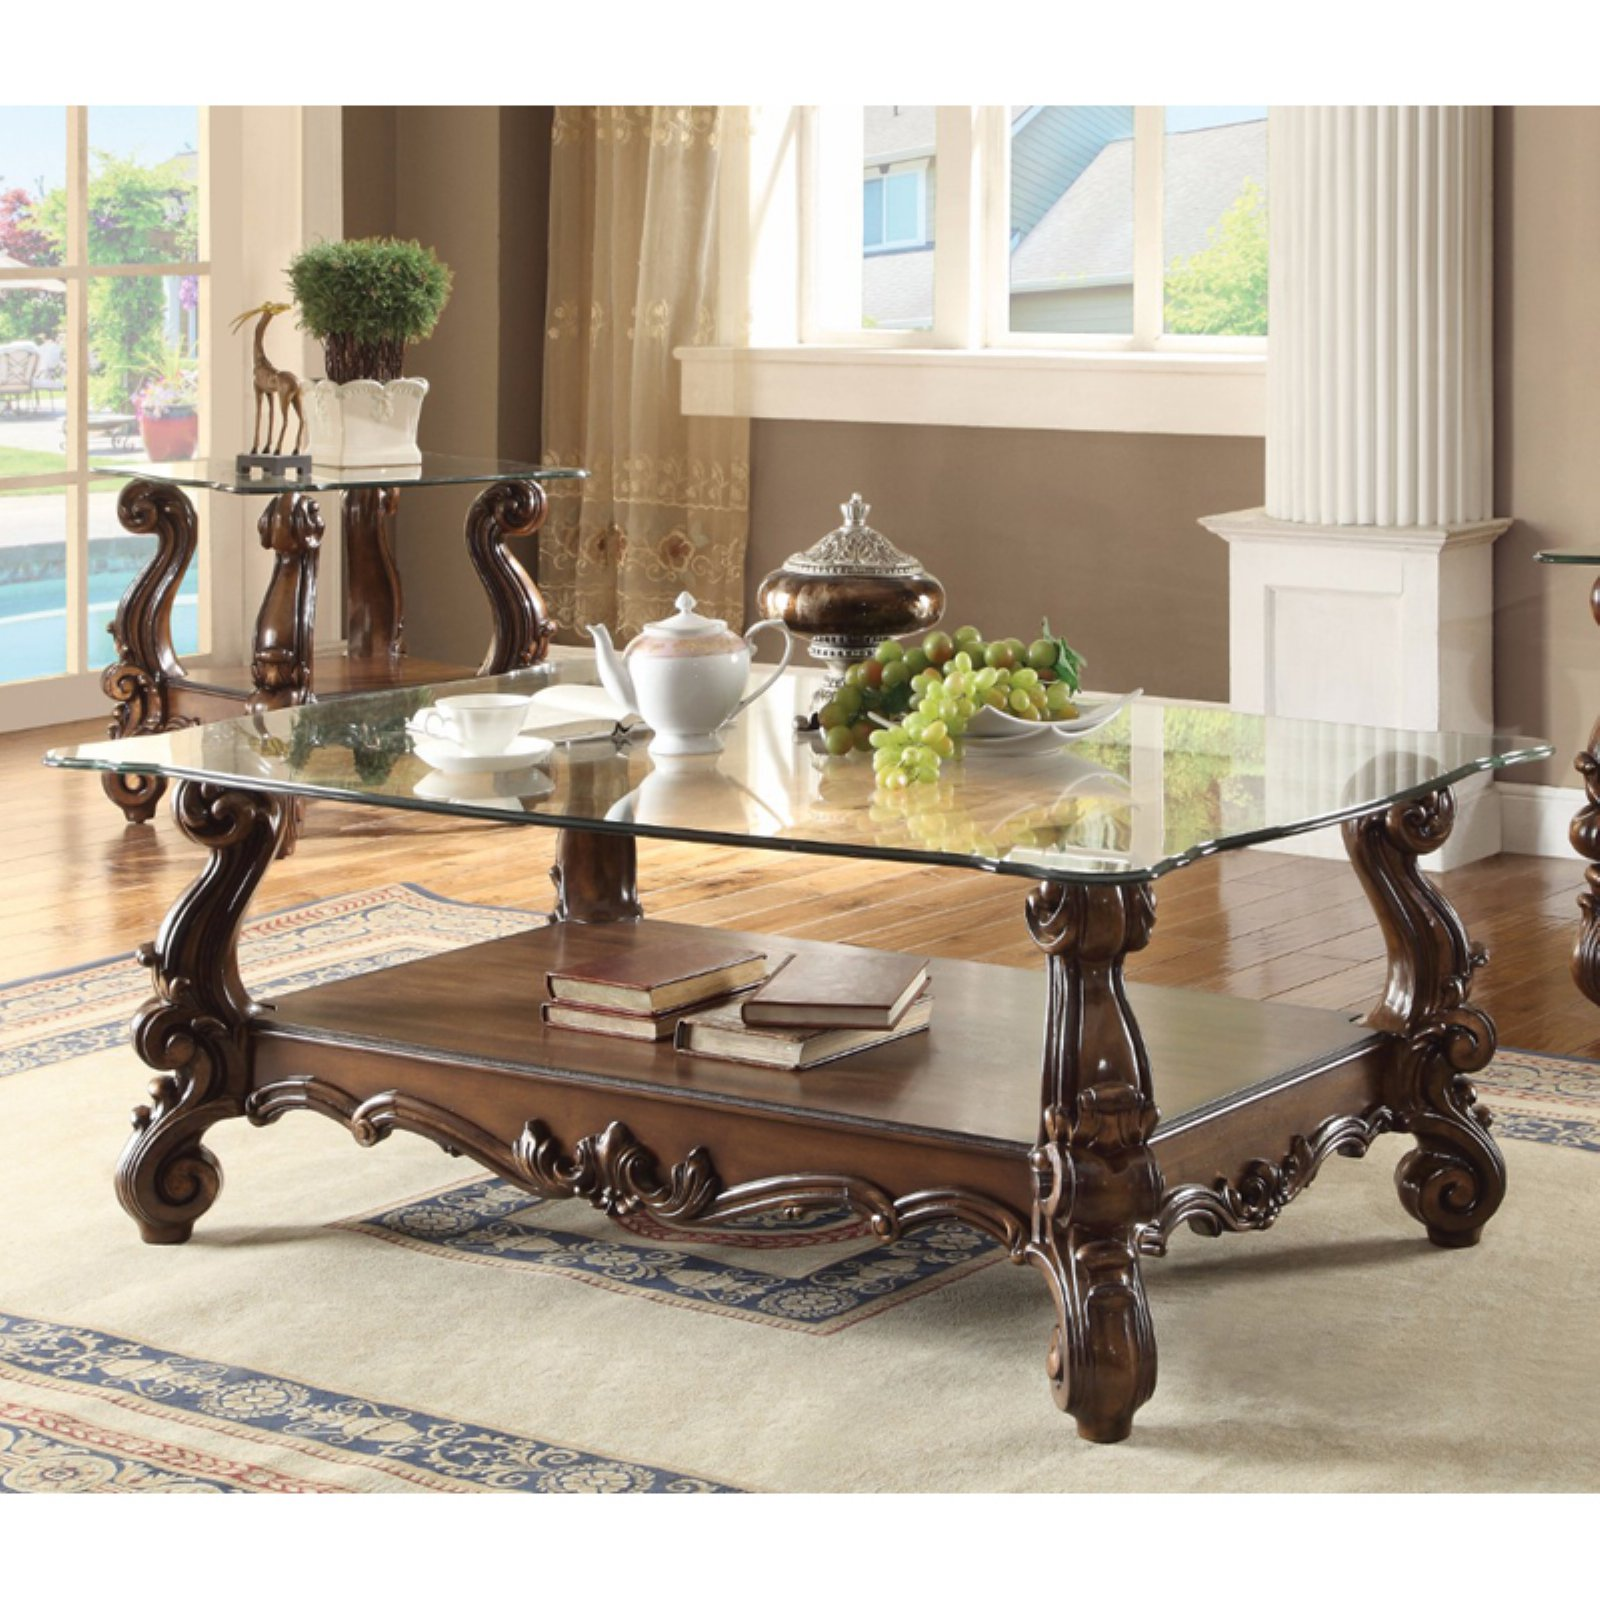 Classy Coffee Table, Cherry Oak & Clear Glass - Walmart.com